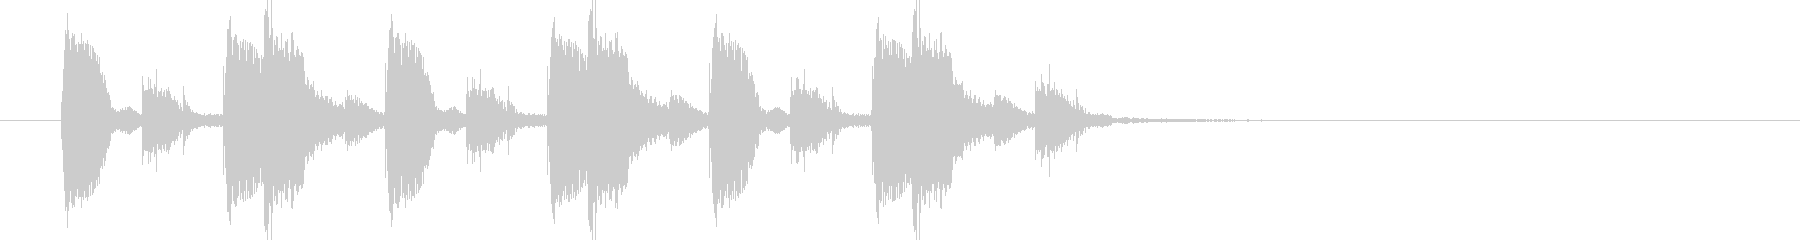 Analog synth techno pop jingle's unreproduced waveform